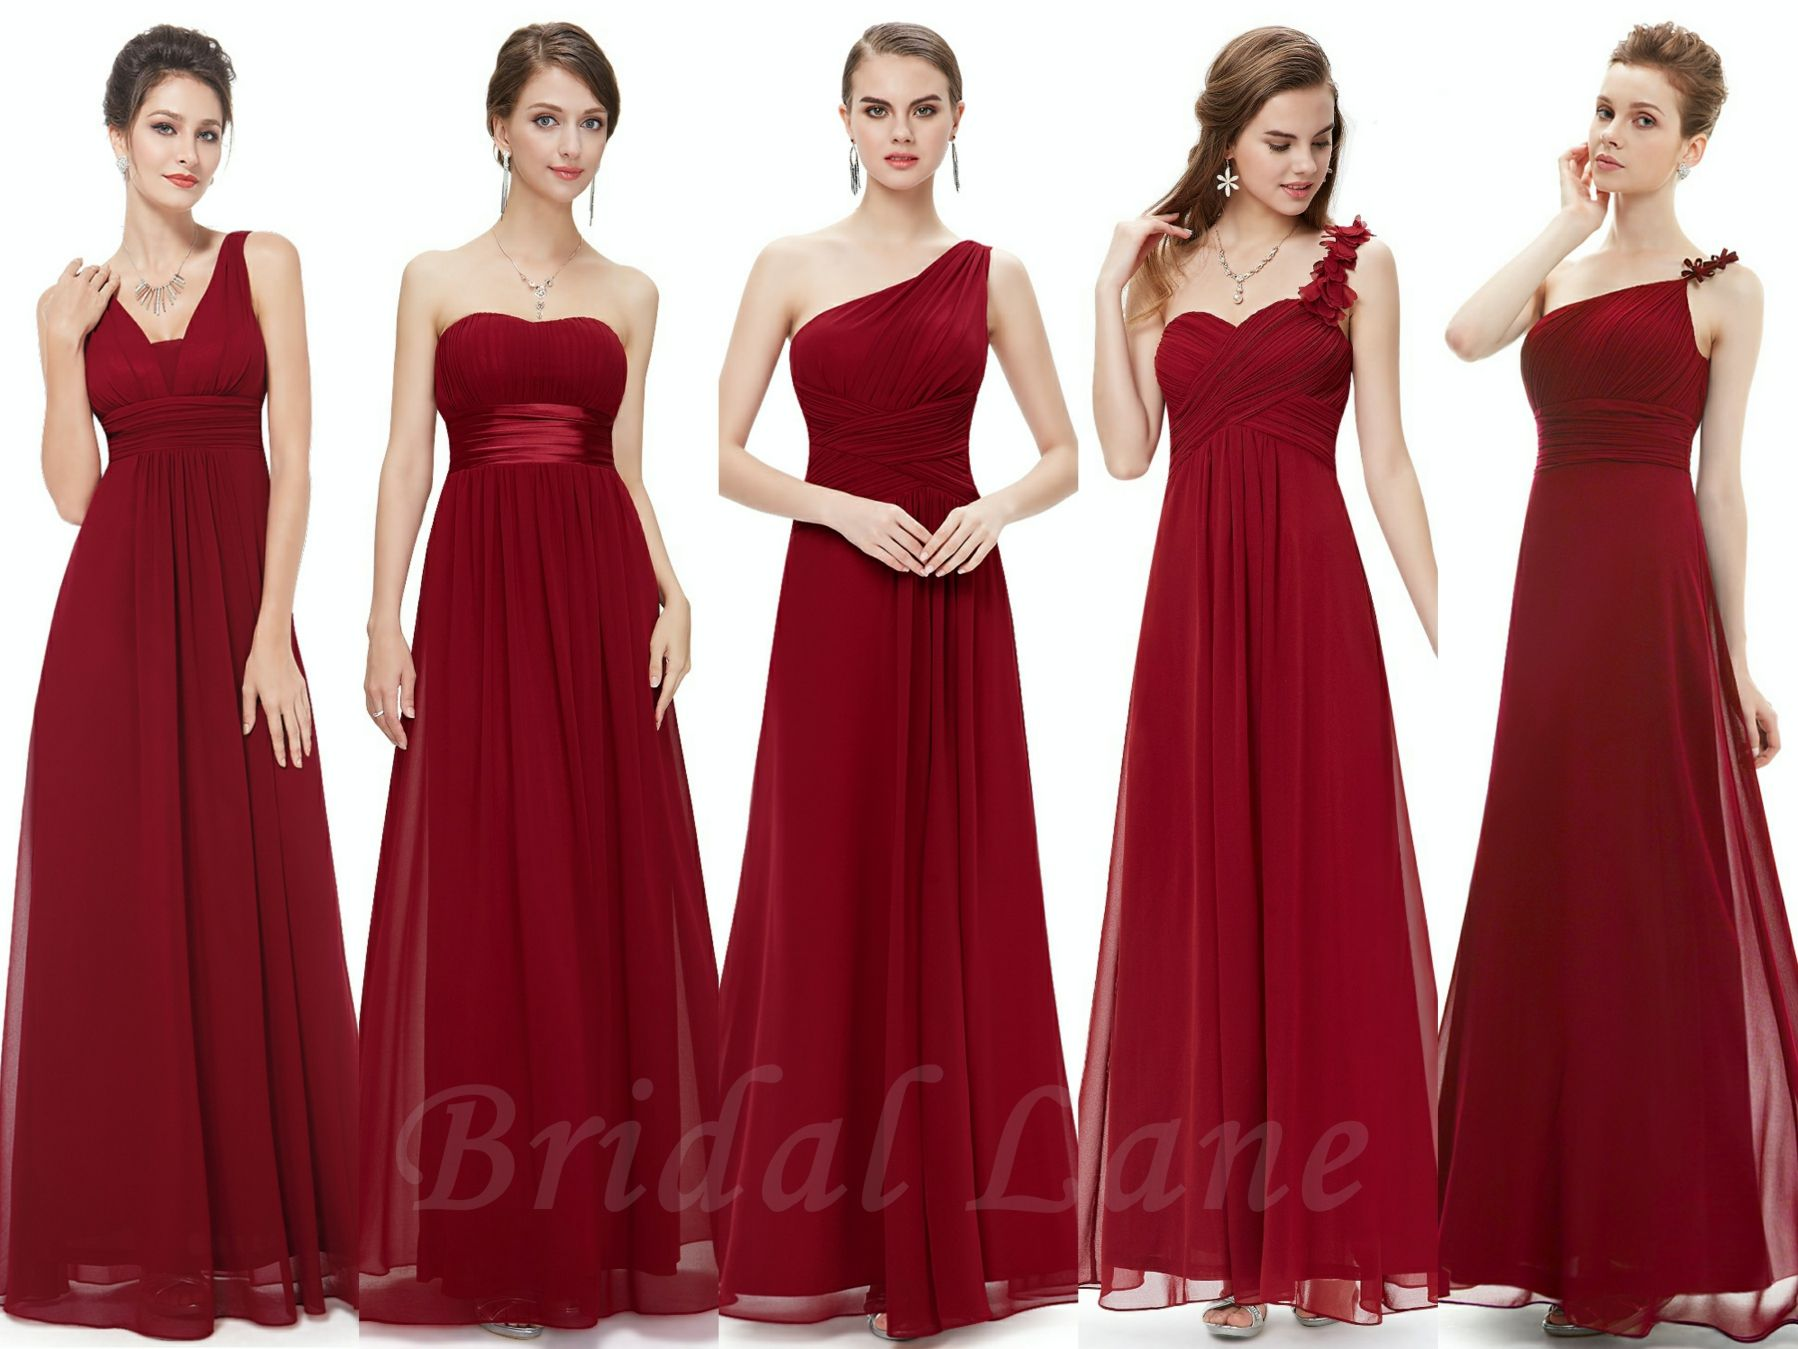 Burgundy / wine red bridesmaid dresses - Bridal Lane, Cape ...